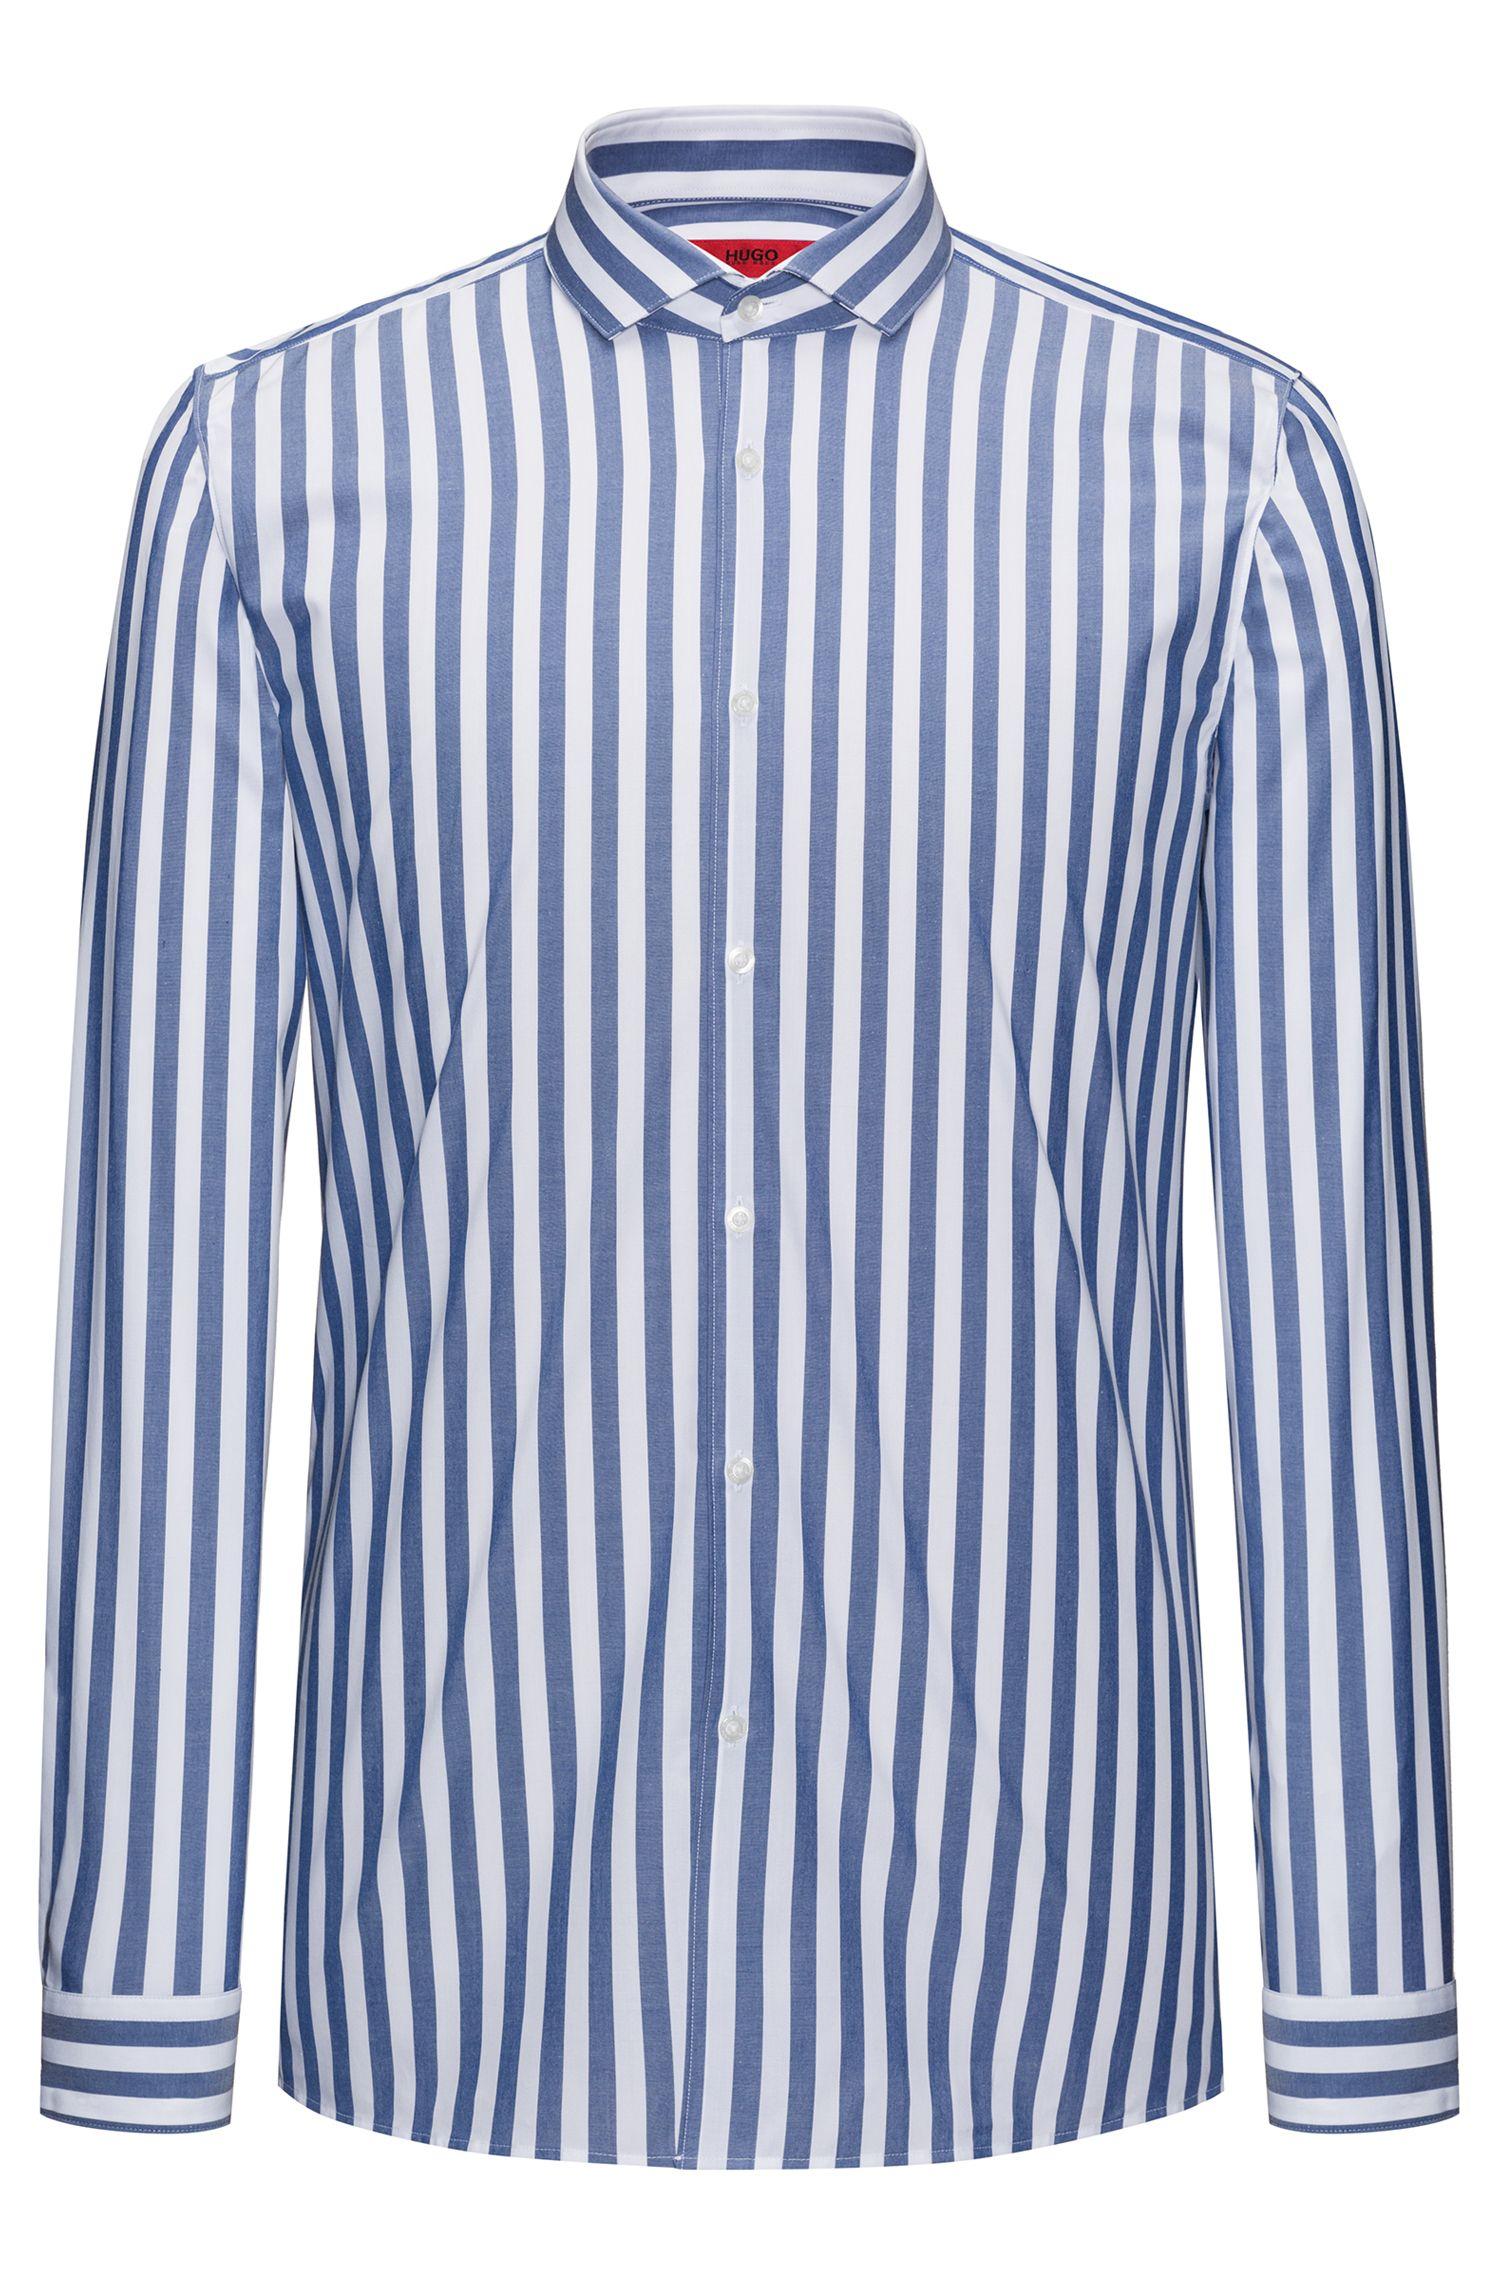 Awning Striped Poplin Sport Shirt, Extra Slim Fit | Erriko